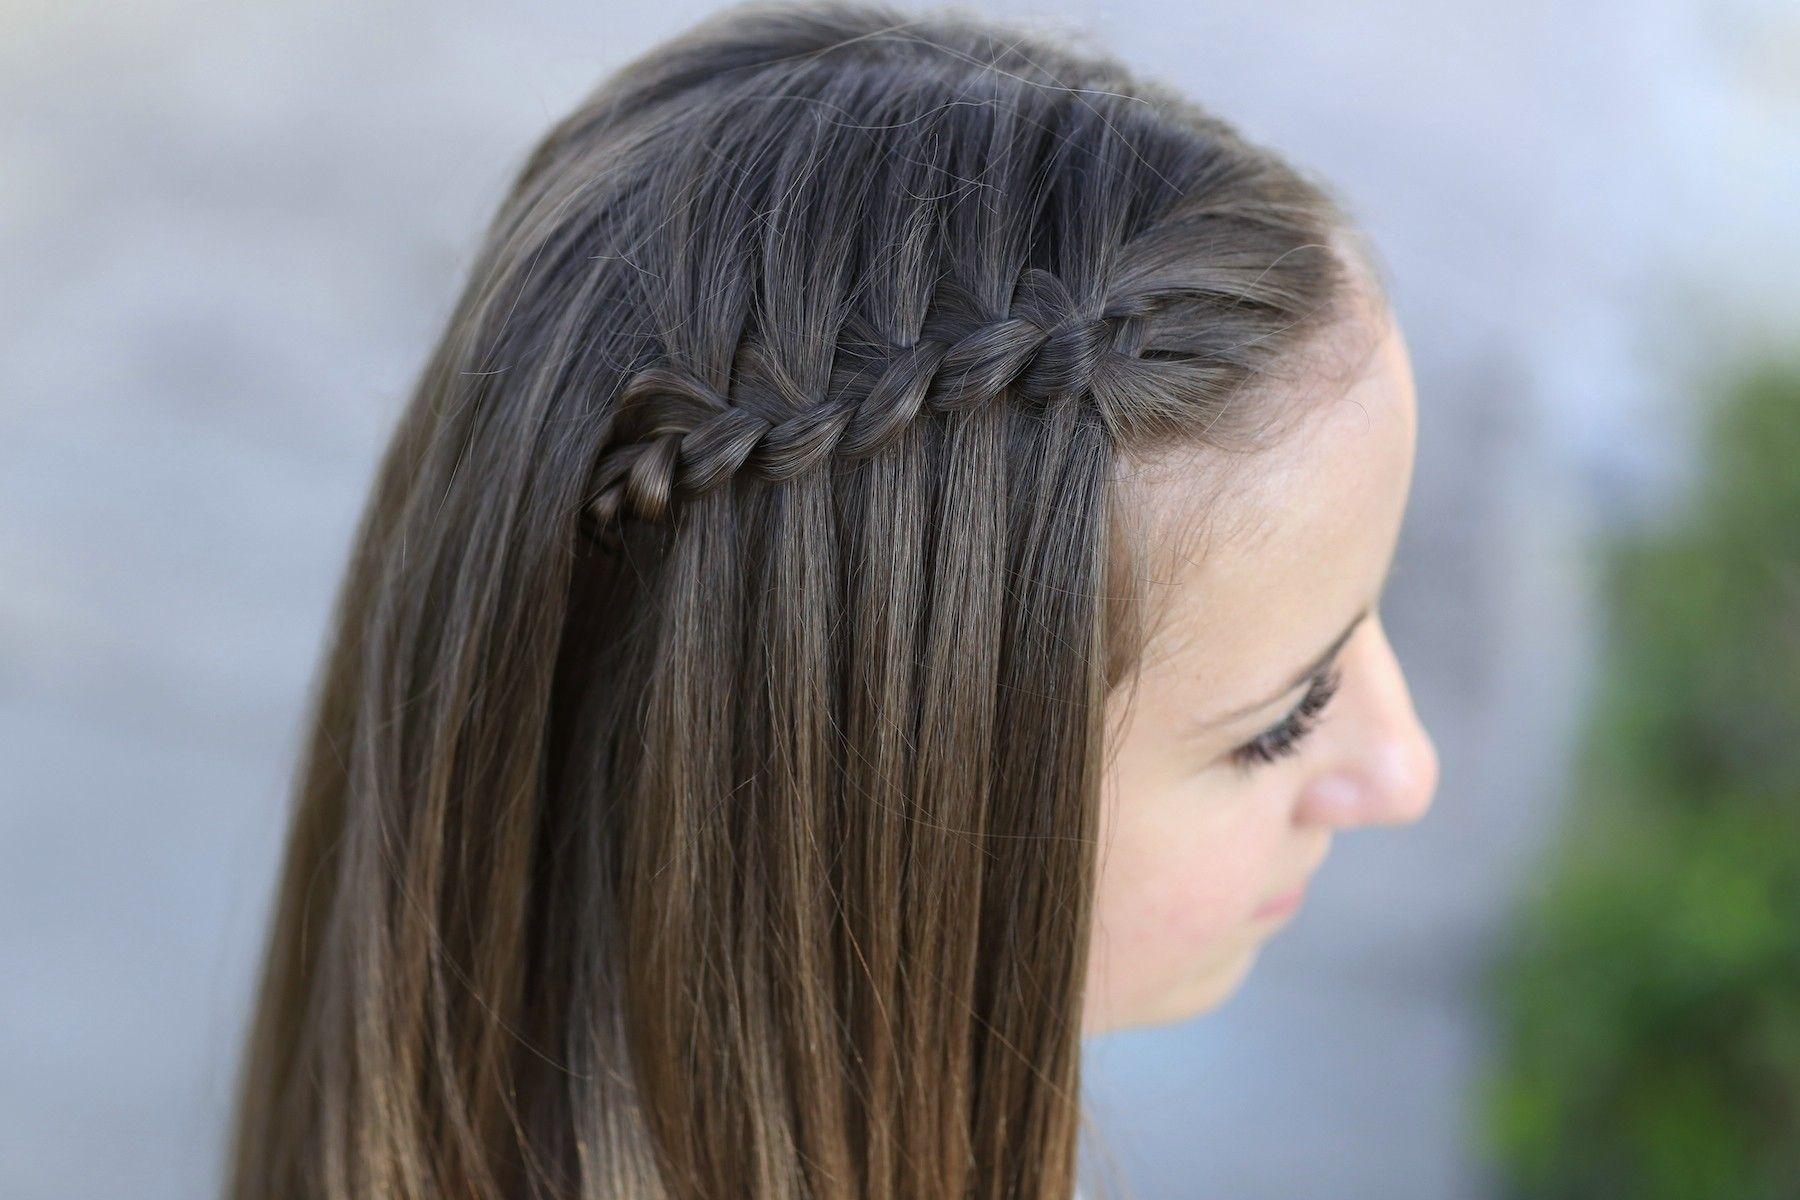 Foto: Reprodução/Cute Girls Hairstyle